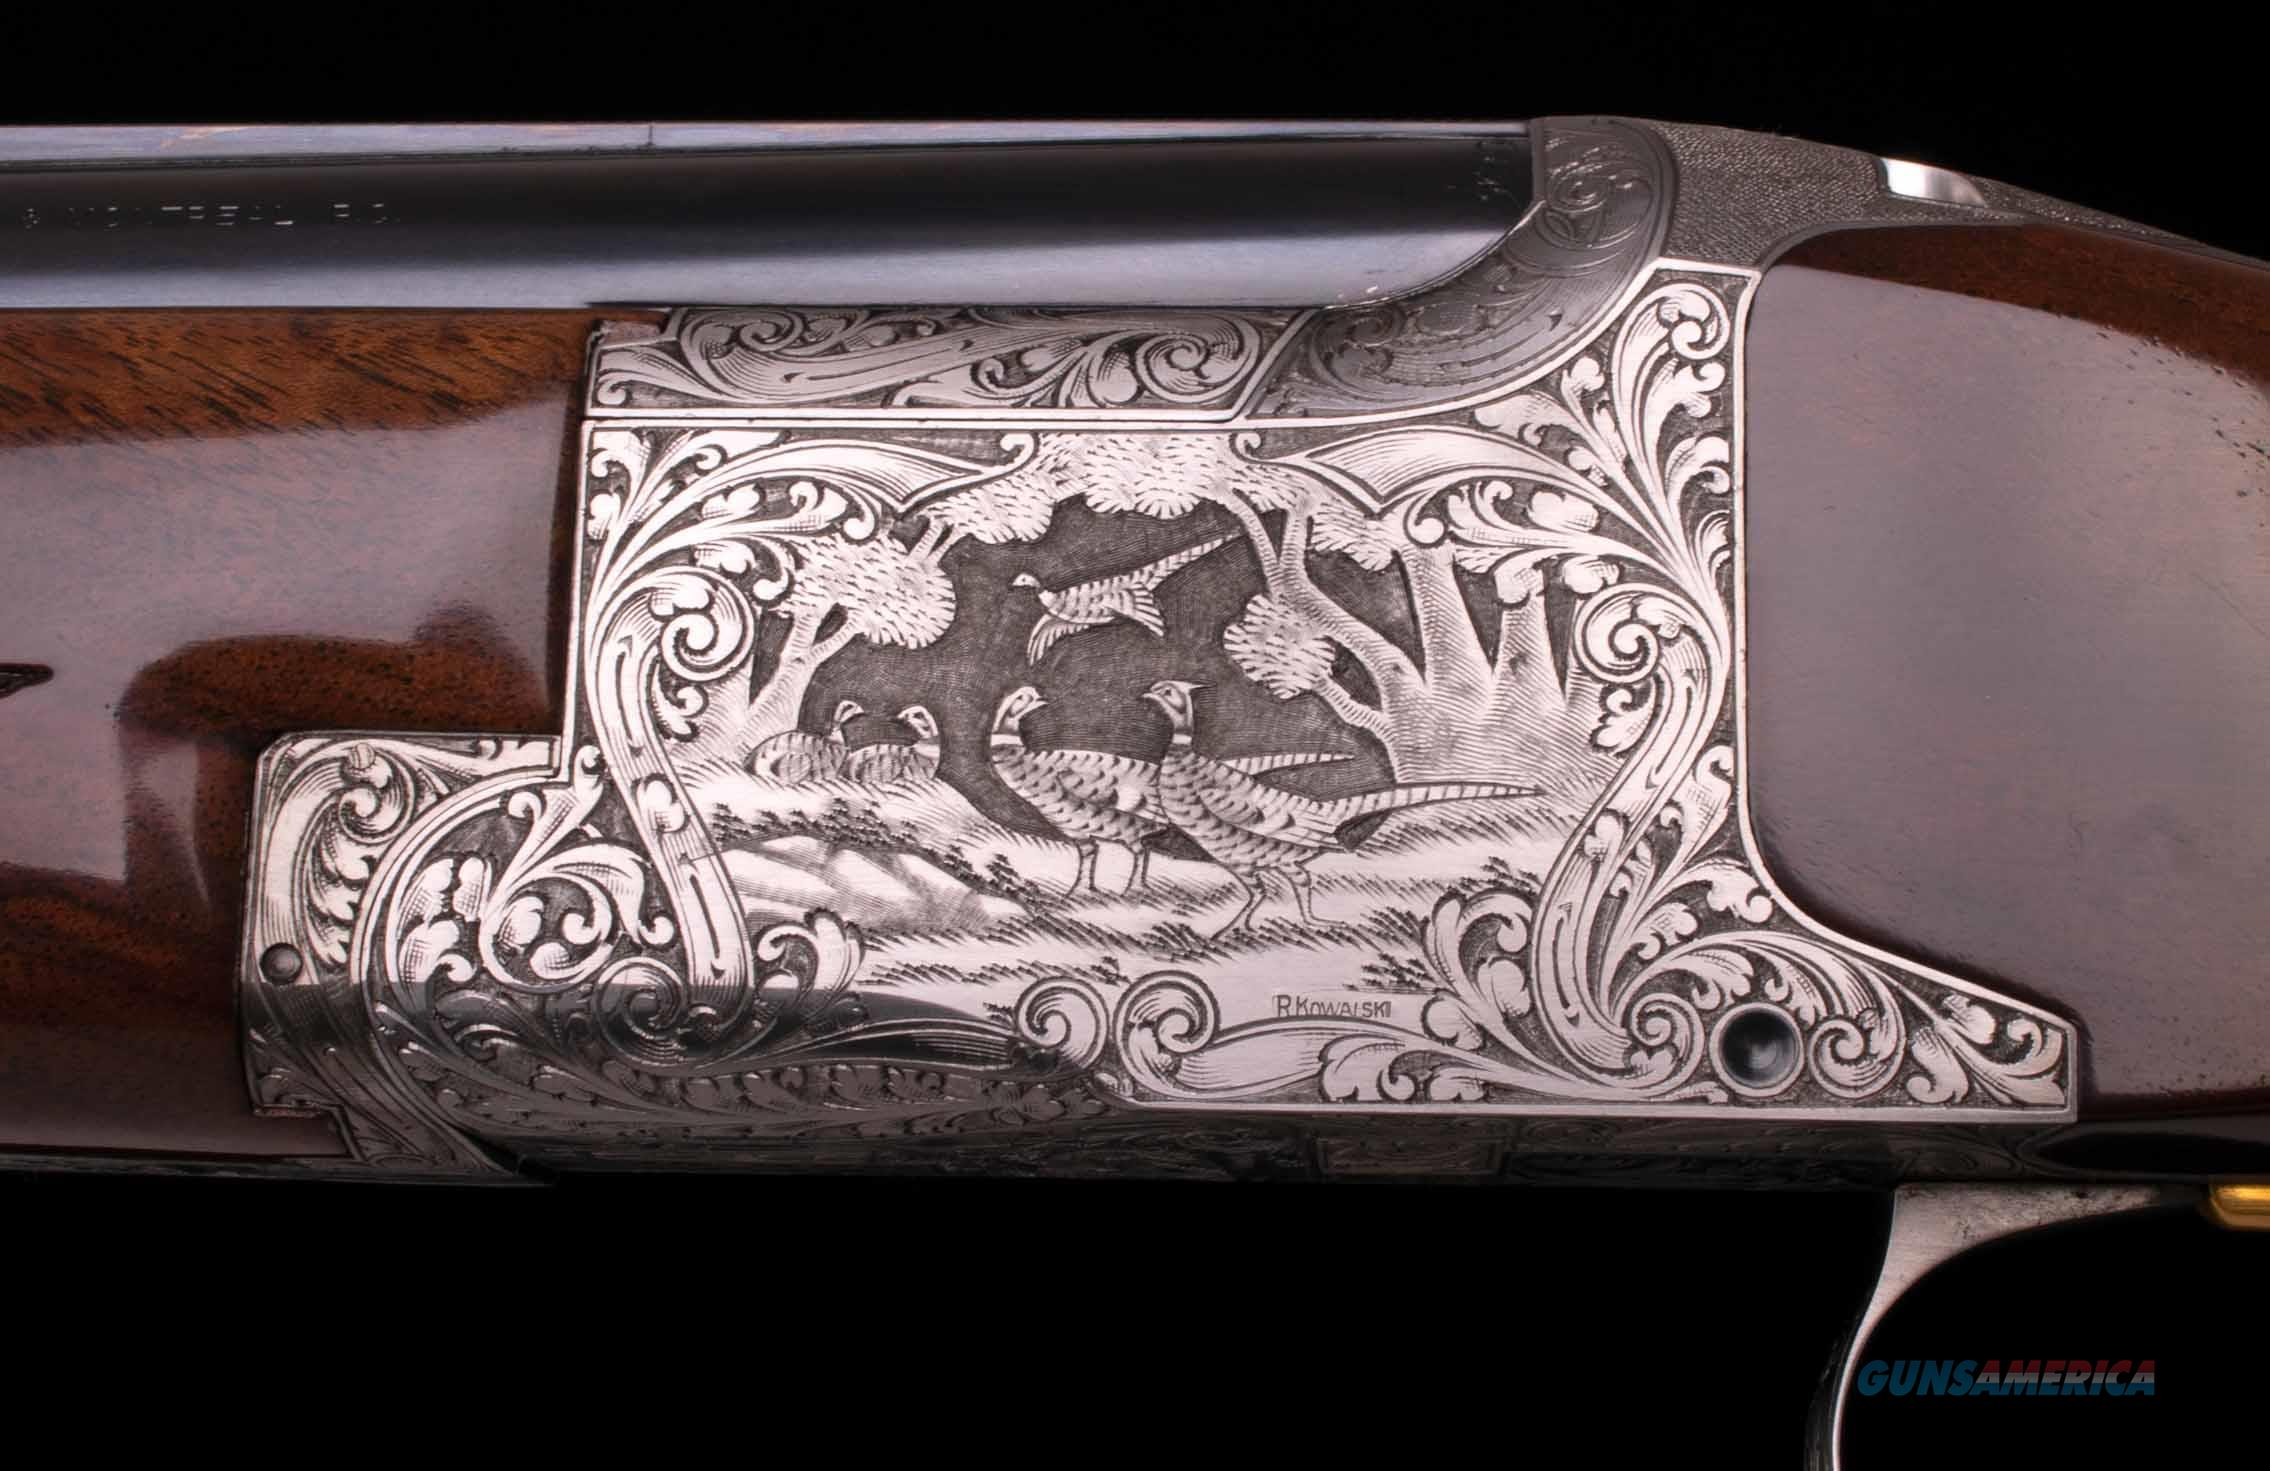 Browning Superposed 4 Gauge Set –DIANA GRADE, RARE 1 of 59 MADE, vintage firearms inc  Guns > Shotguns > Browning Shotguns > Over Unders > Belgian Manufacture